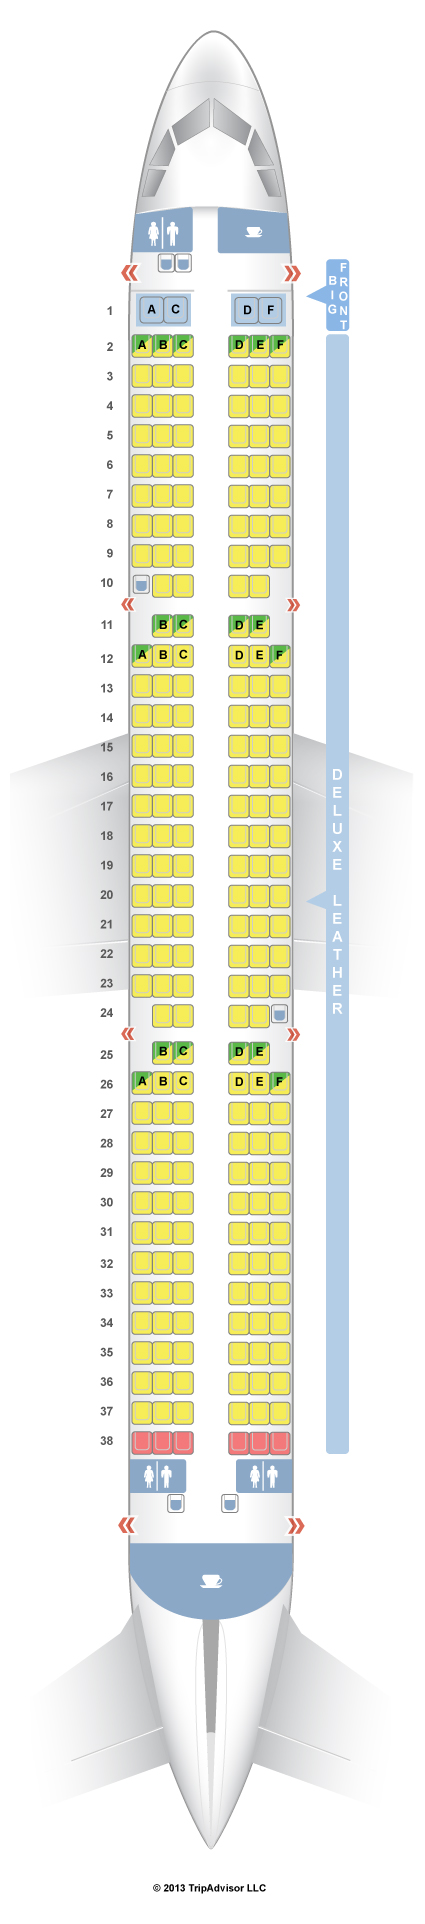 Seatguru Seat Map Spirit Airbus A321 321 V1